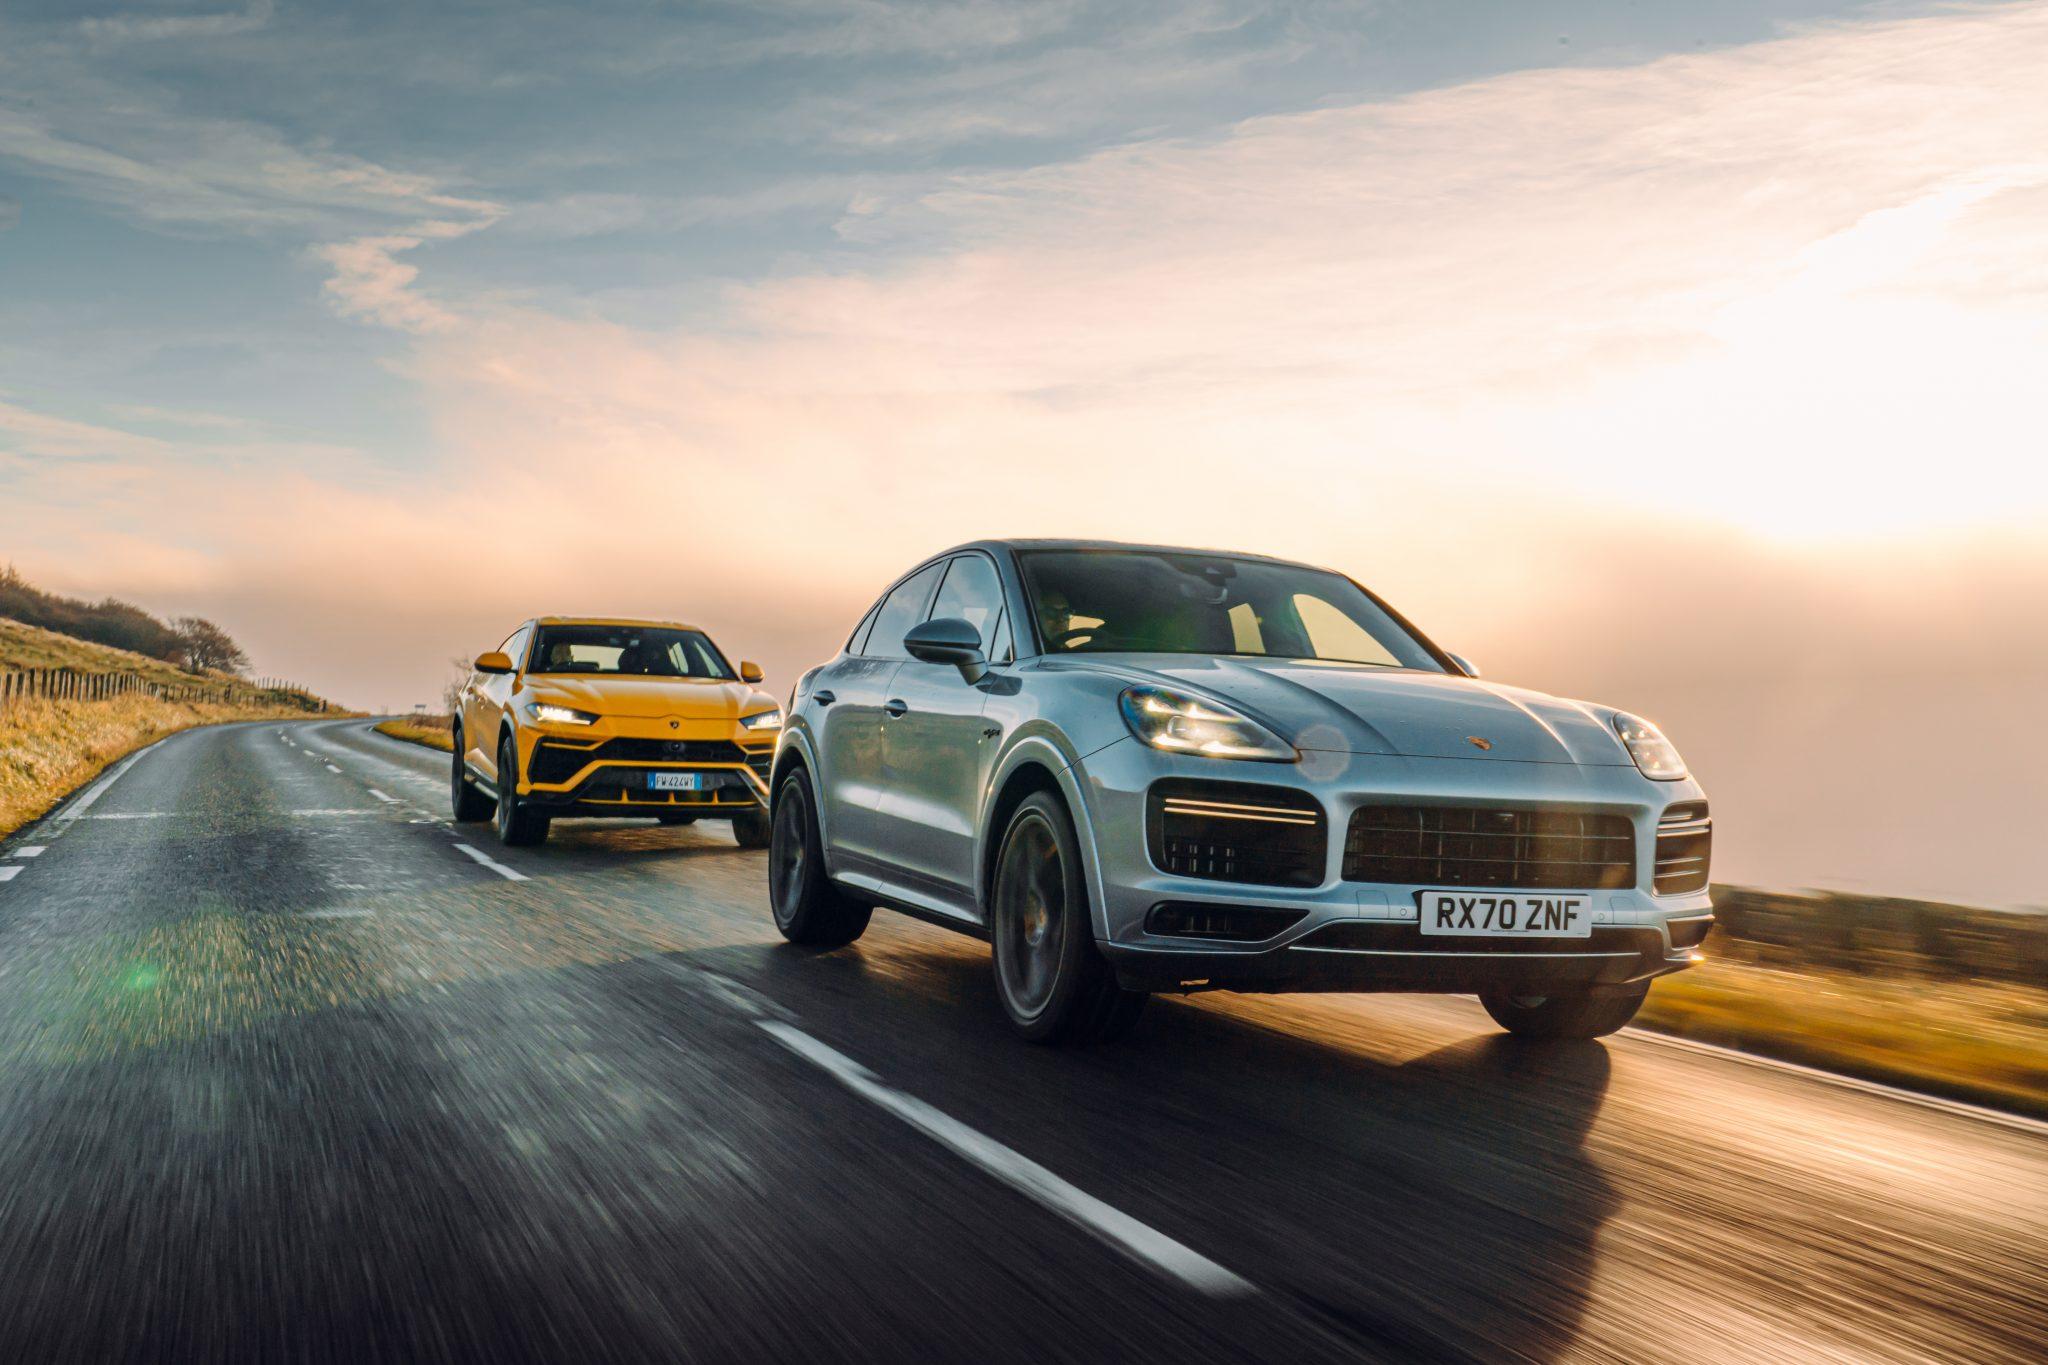 Lamborghini Urus en Porsche Cayenne tTurbo S-E Hybrid